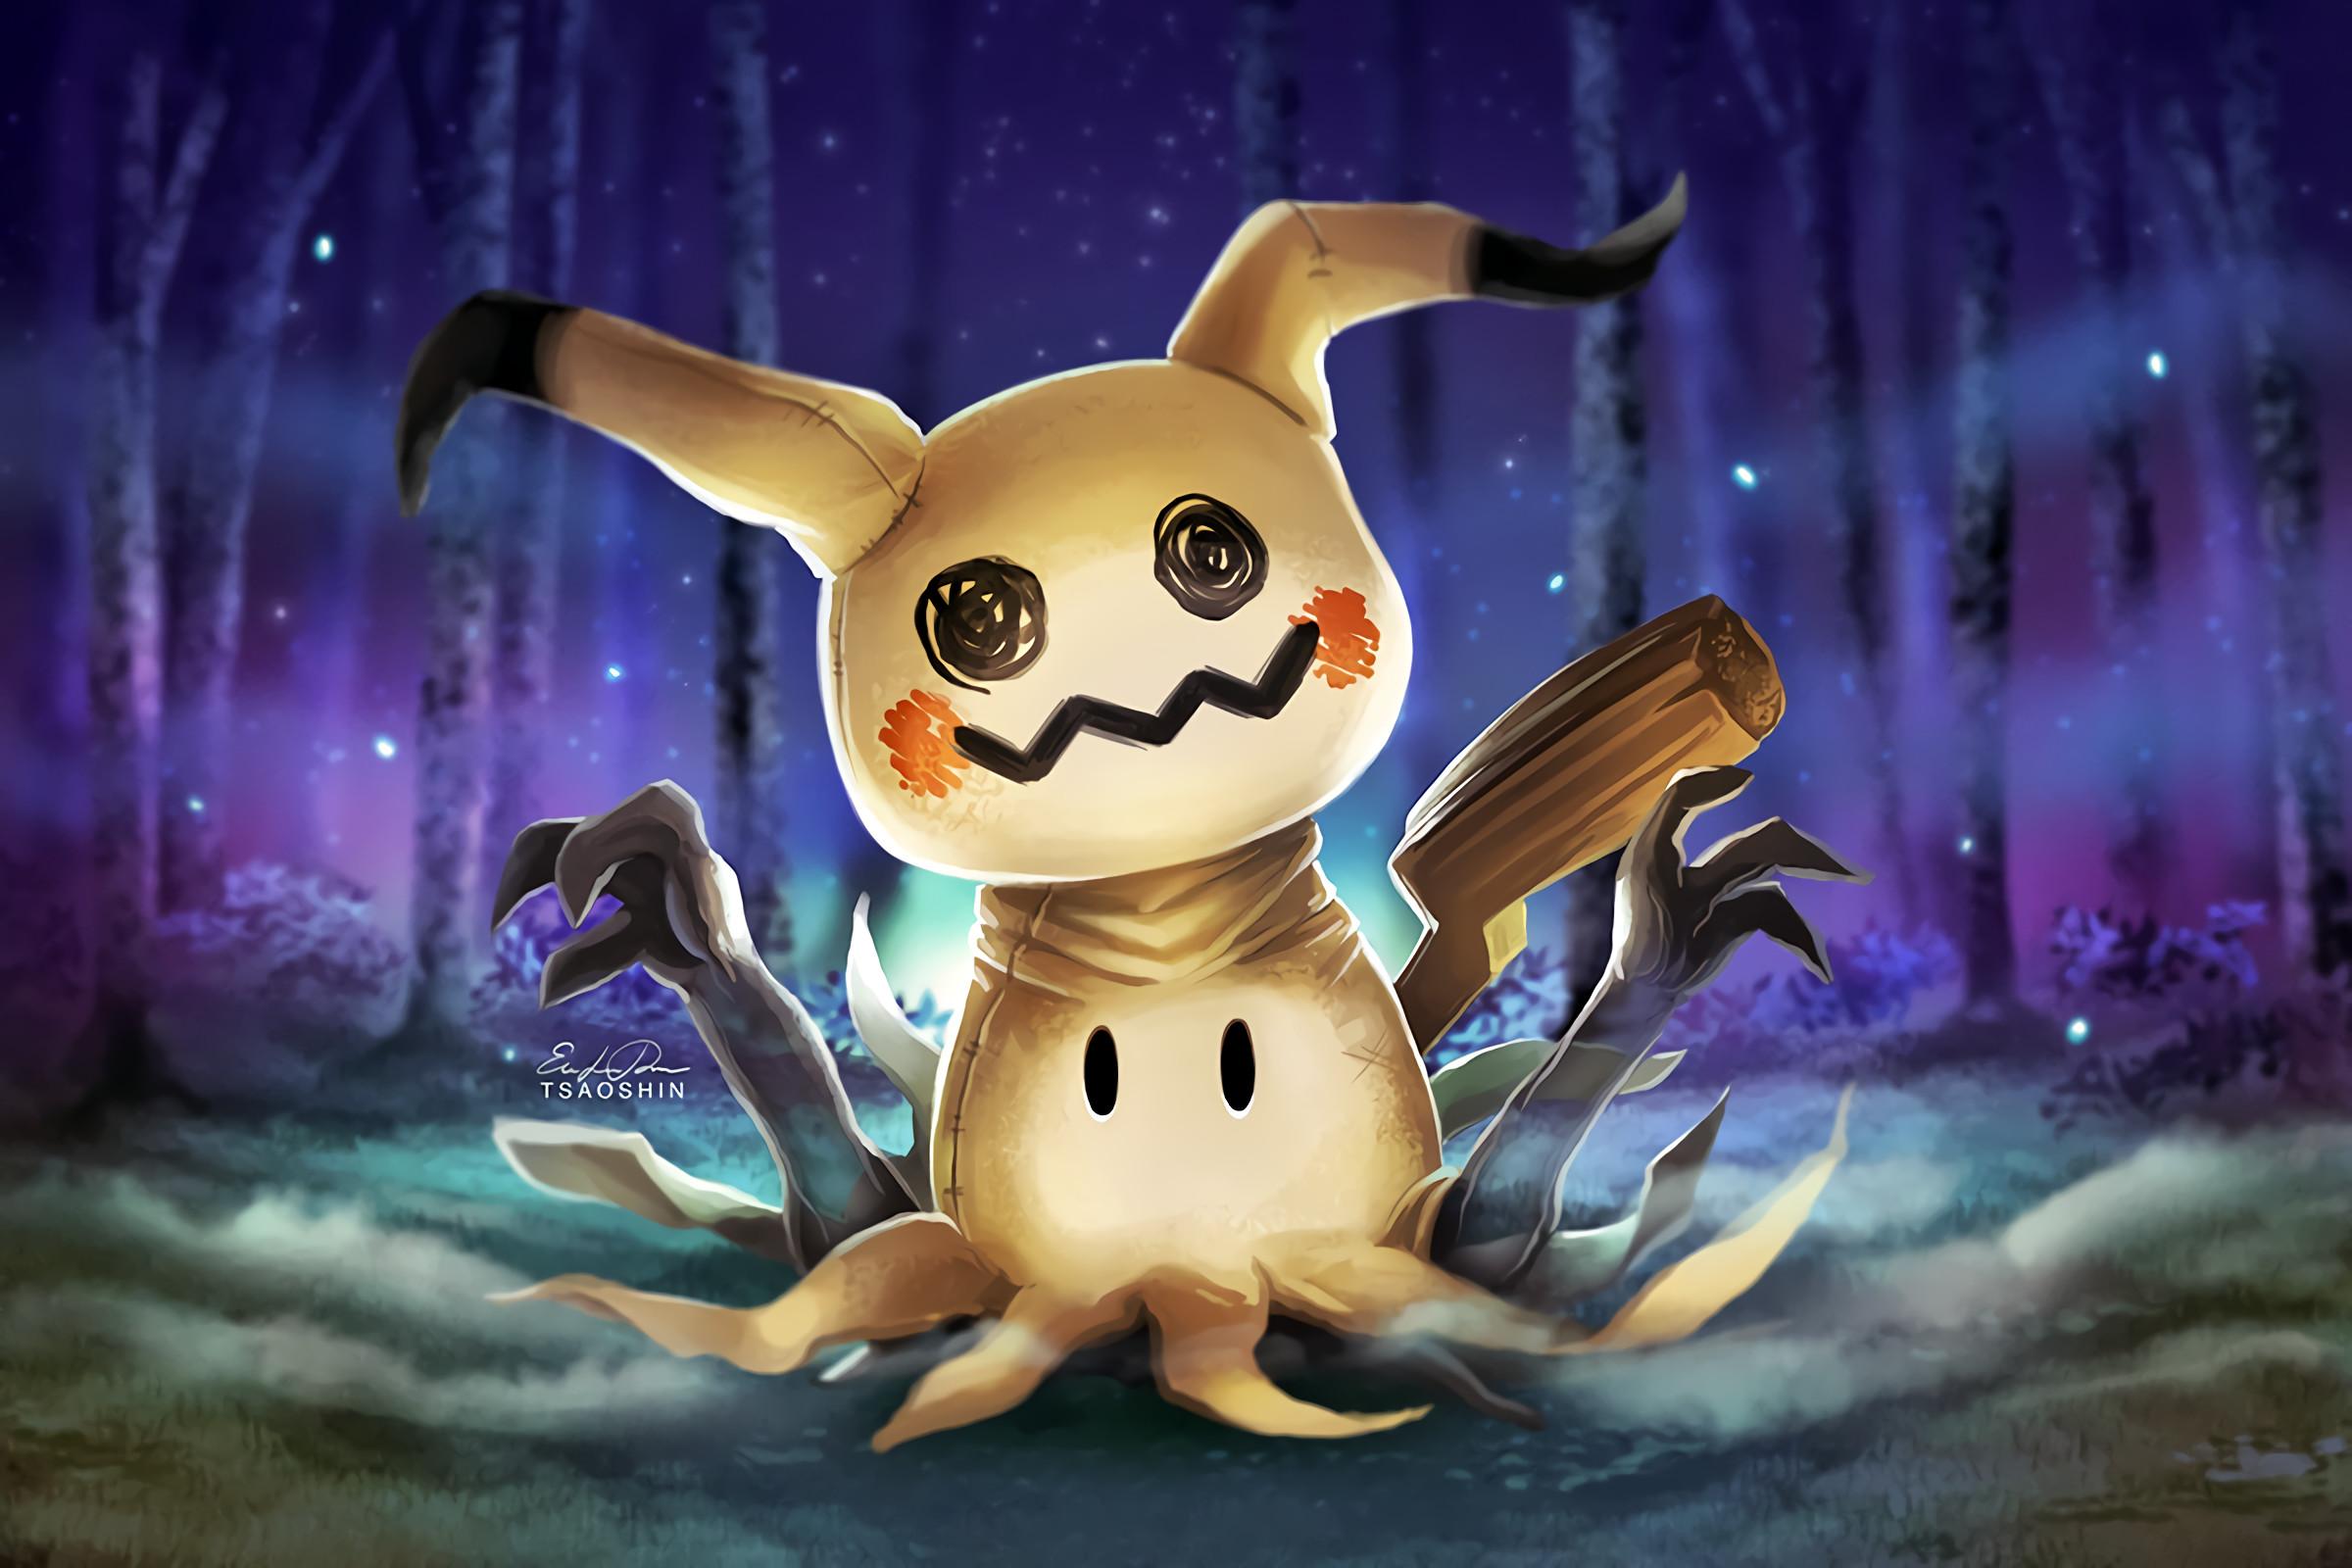 Video Game РPok̩mon Sun and Moon Mimikkyu (Pokemon) Pok̩mon Wallpaper